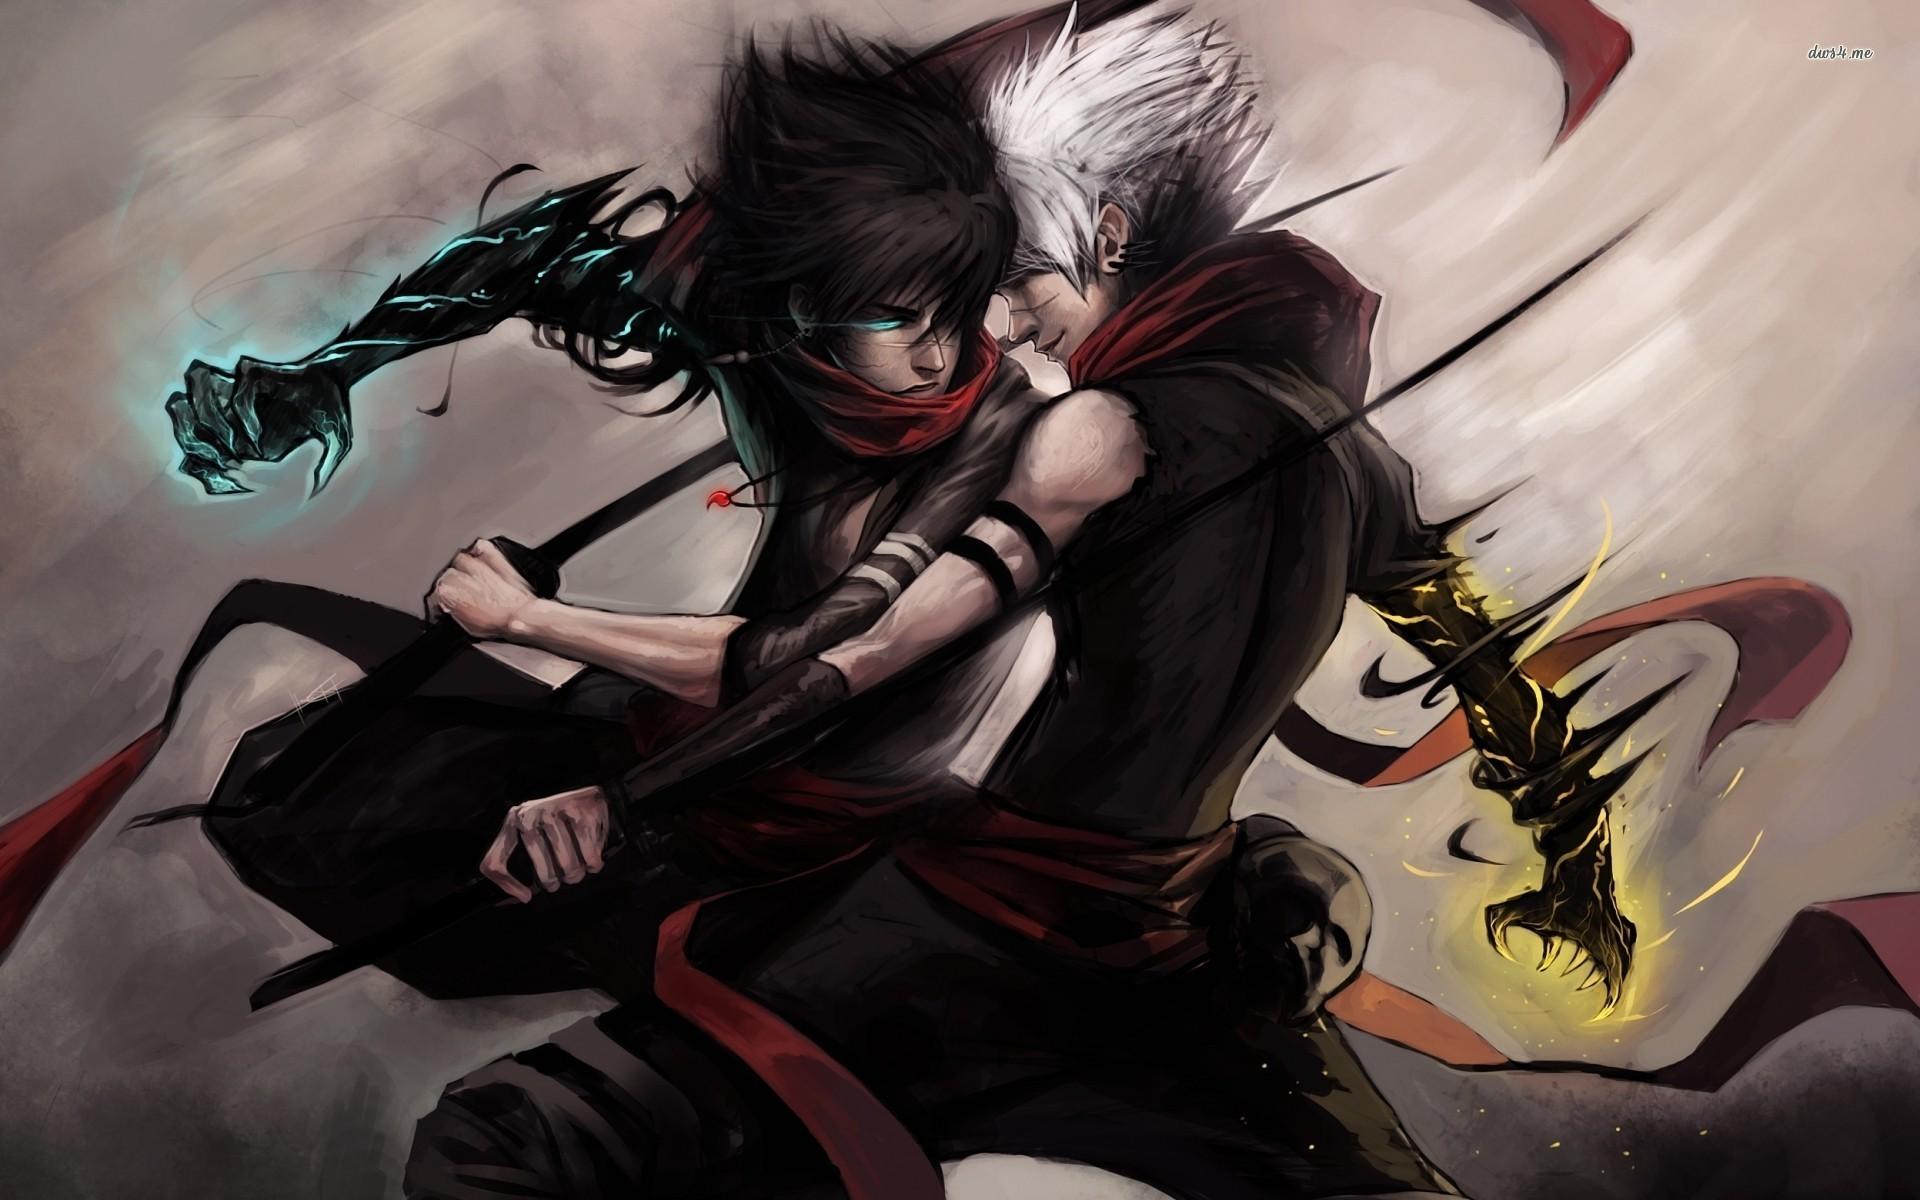 Anime warrior wallpaper - Anime male wallpaper hd ...